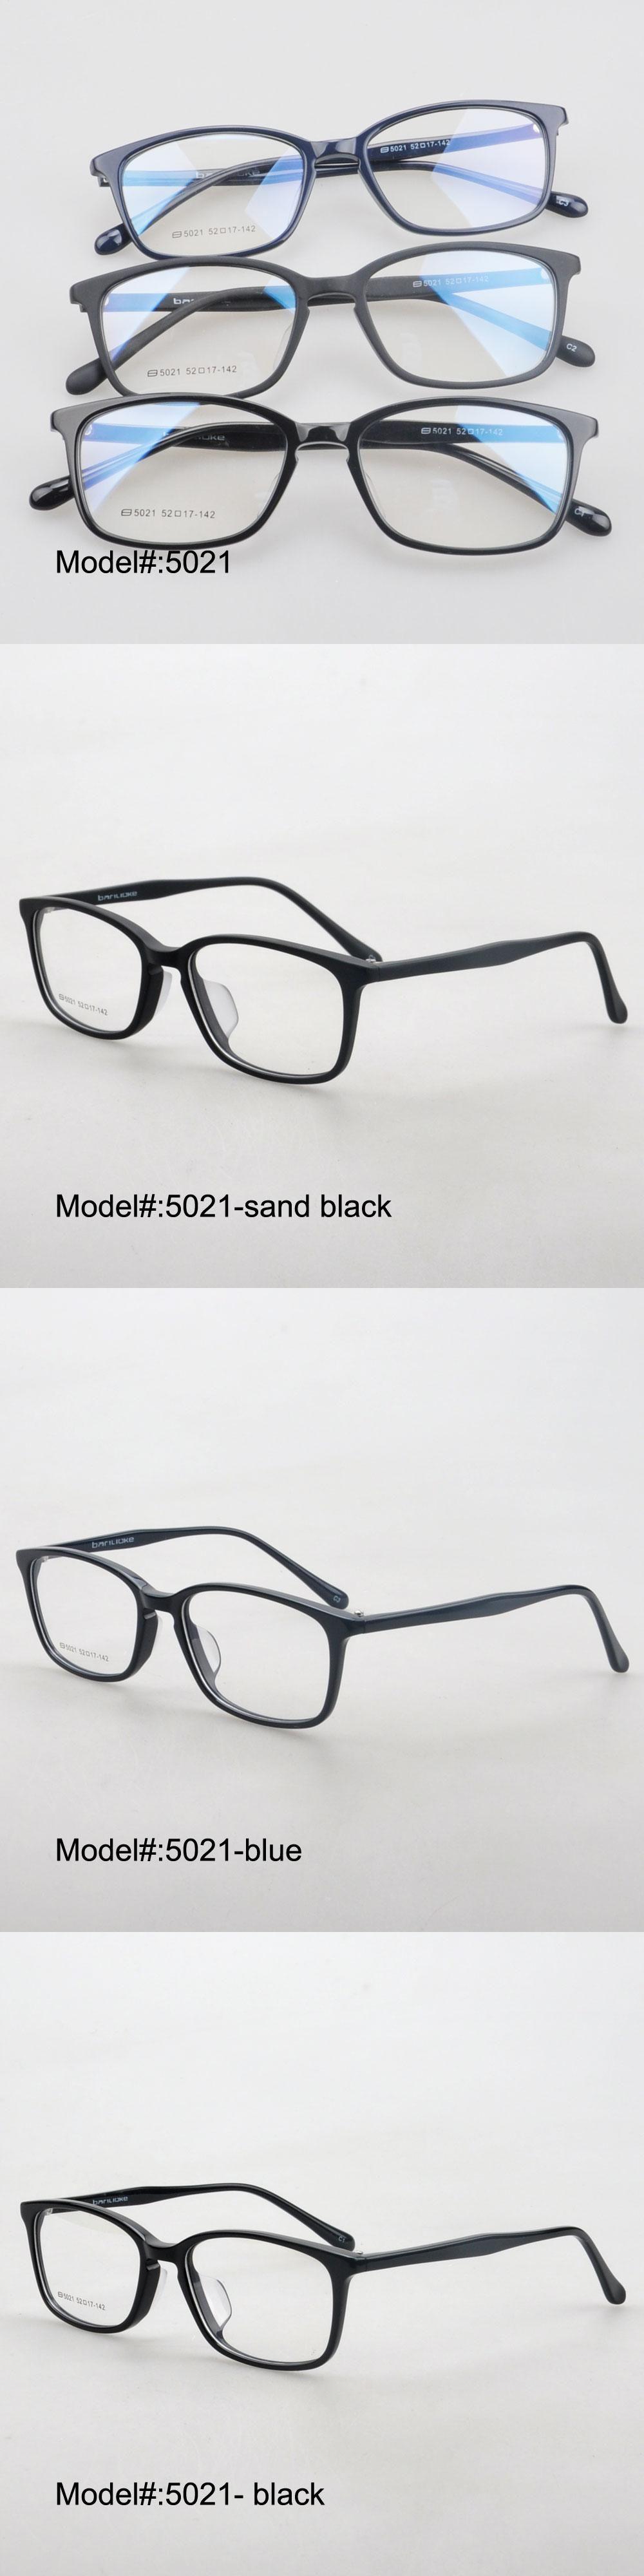 MY DOLI 5021 full rim unisex acetate RX optical frames myopia ...